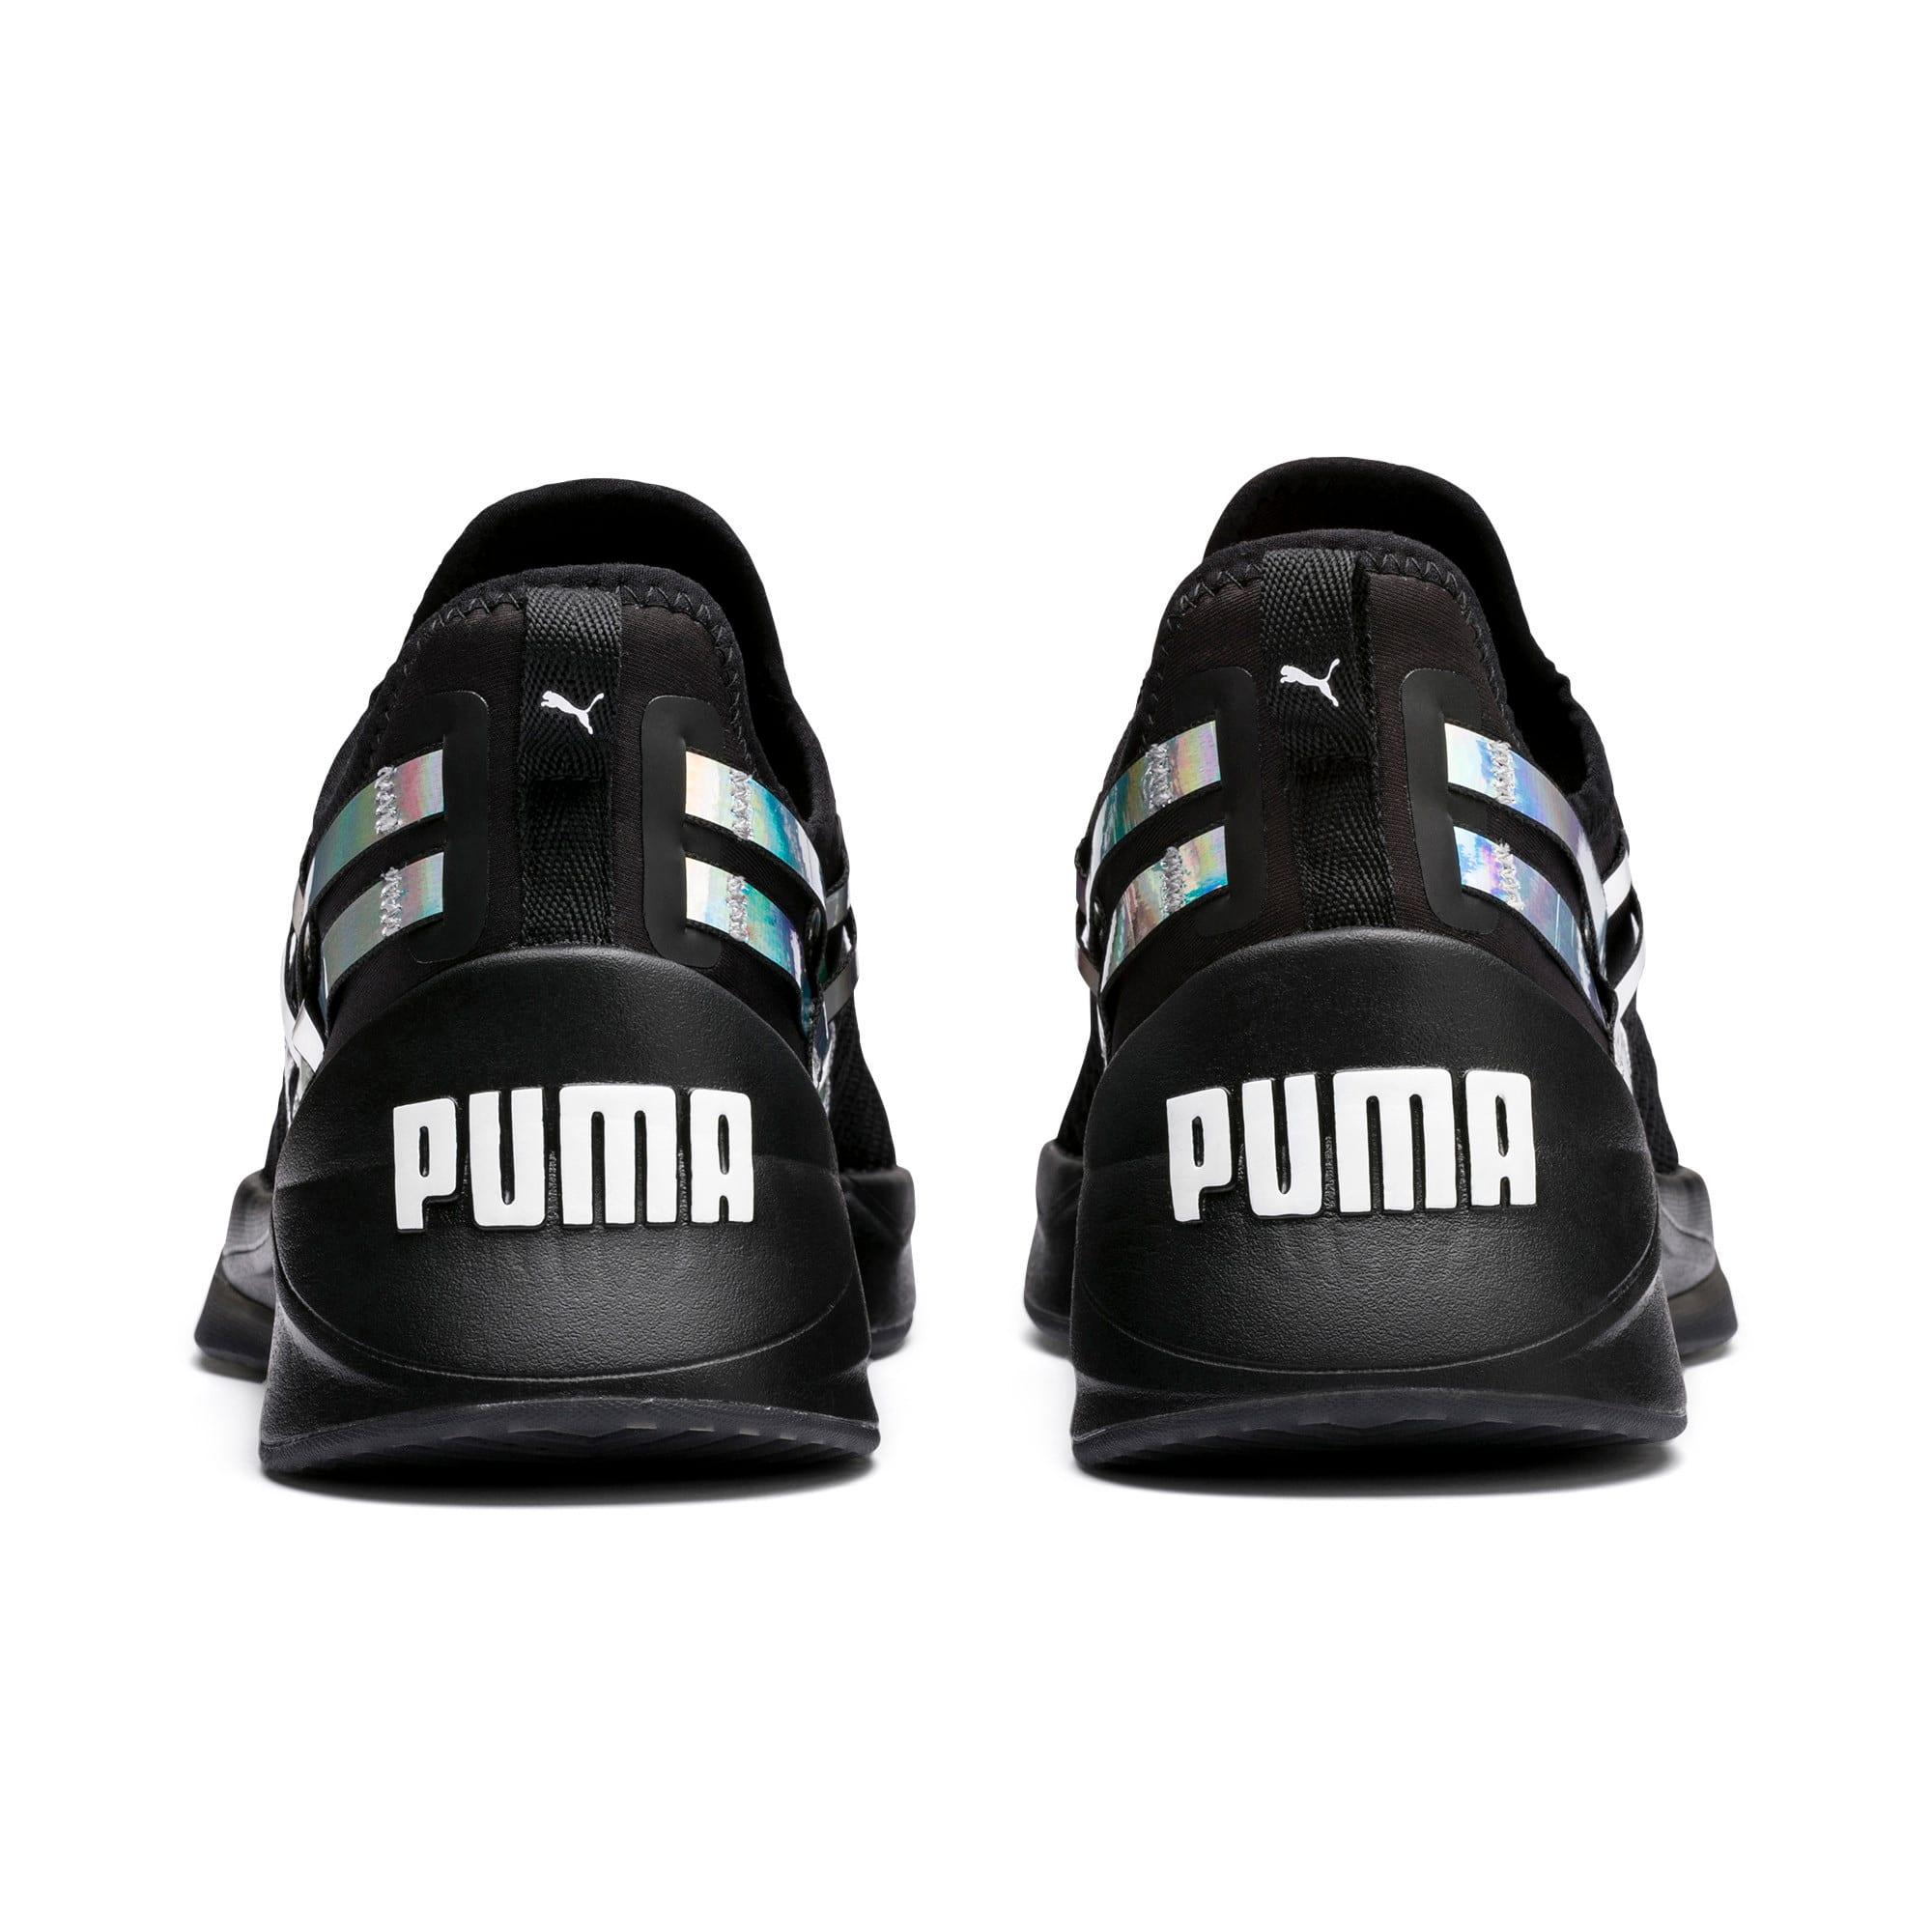 Thumbnail 4 of Jaab XT Iridescent TZ Damen Trainingsschuhe, Puma Black-Puma Black, medium